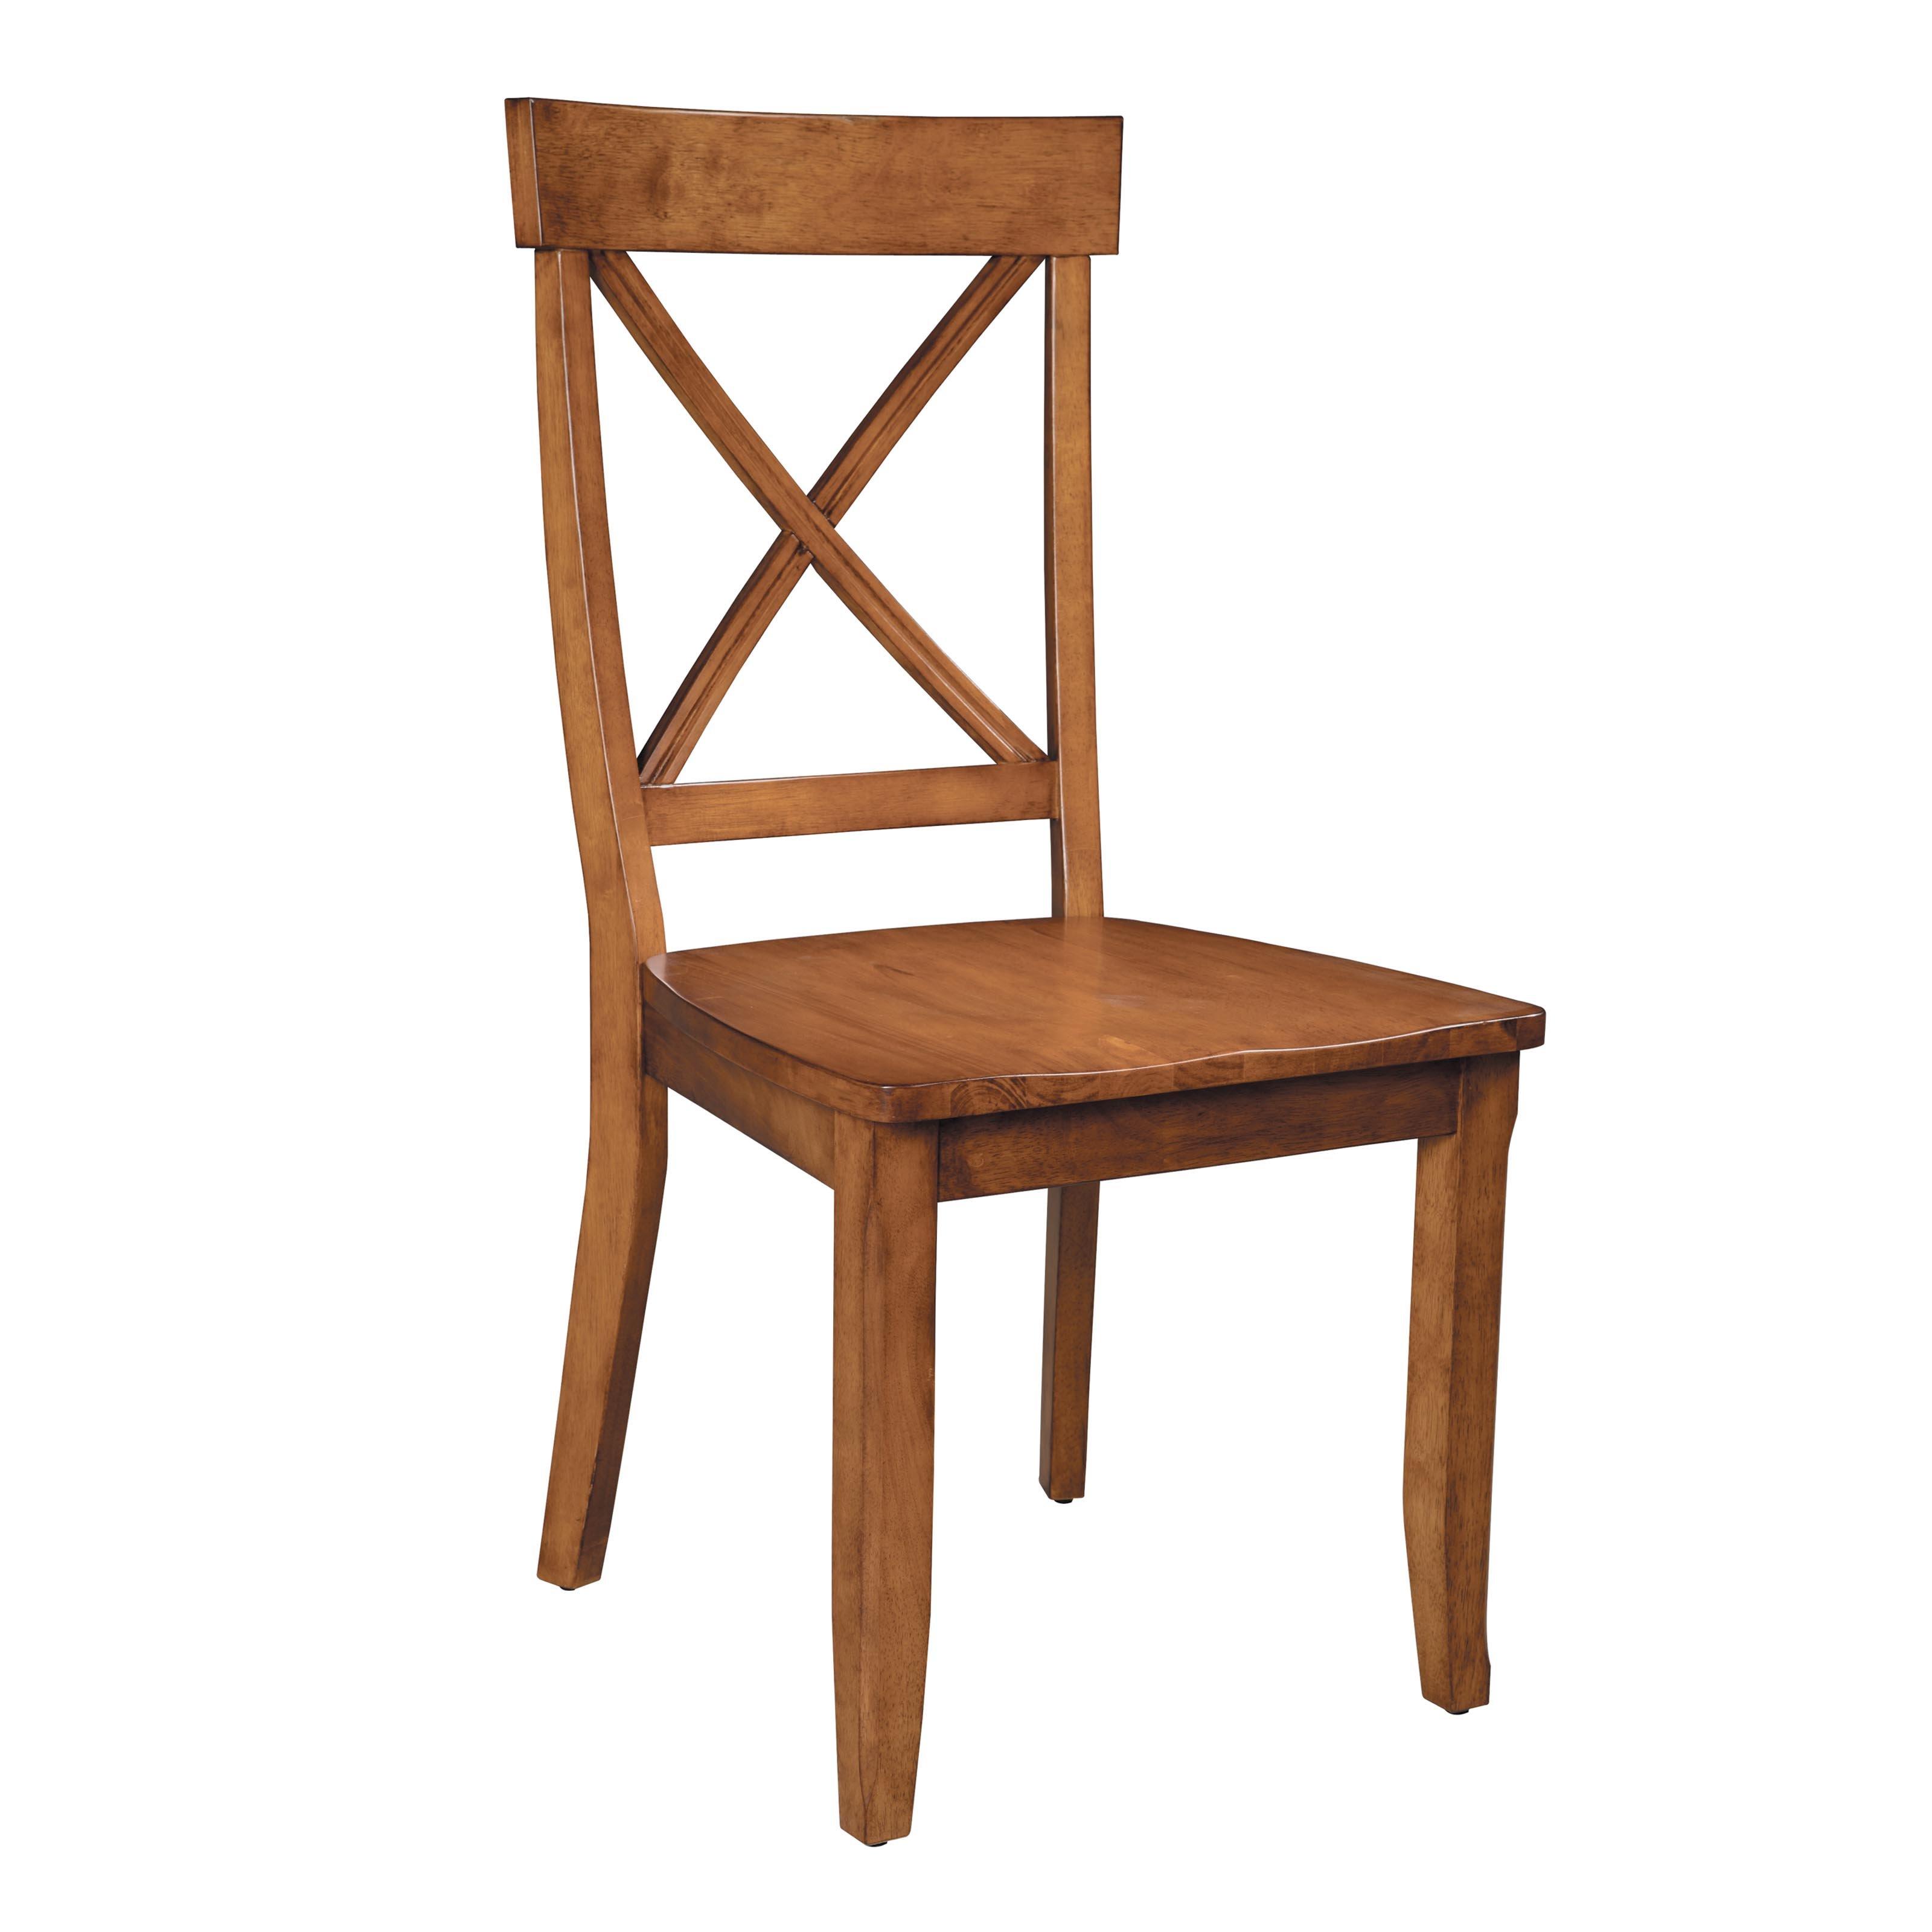 Kitchen chairs wood photo - 2